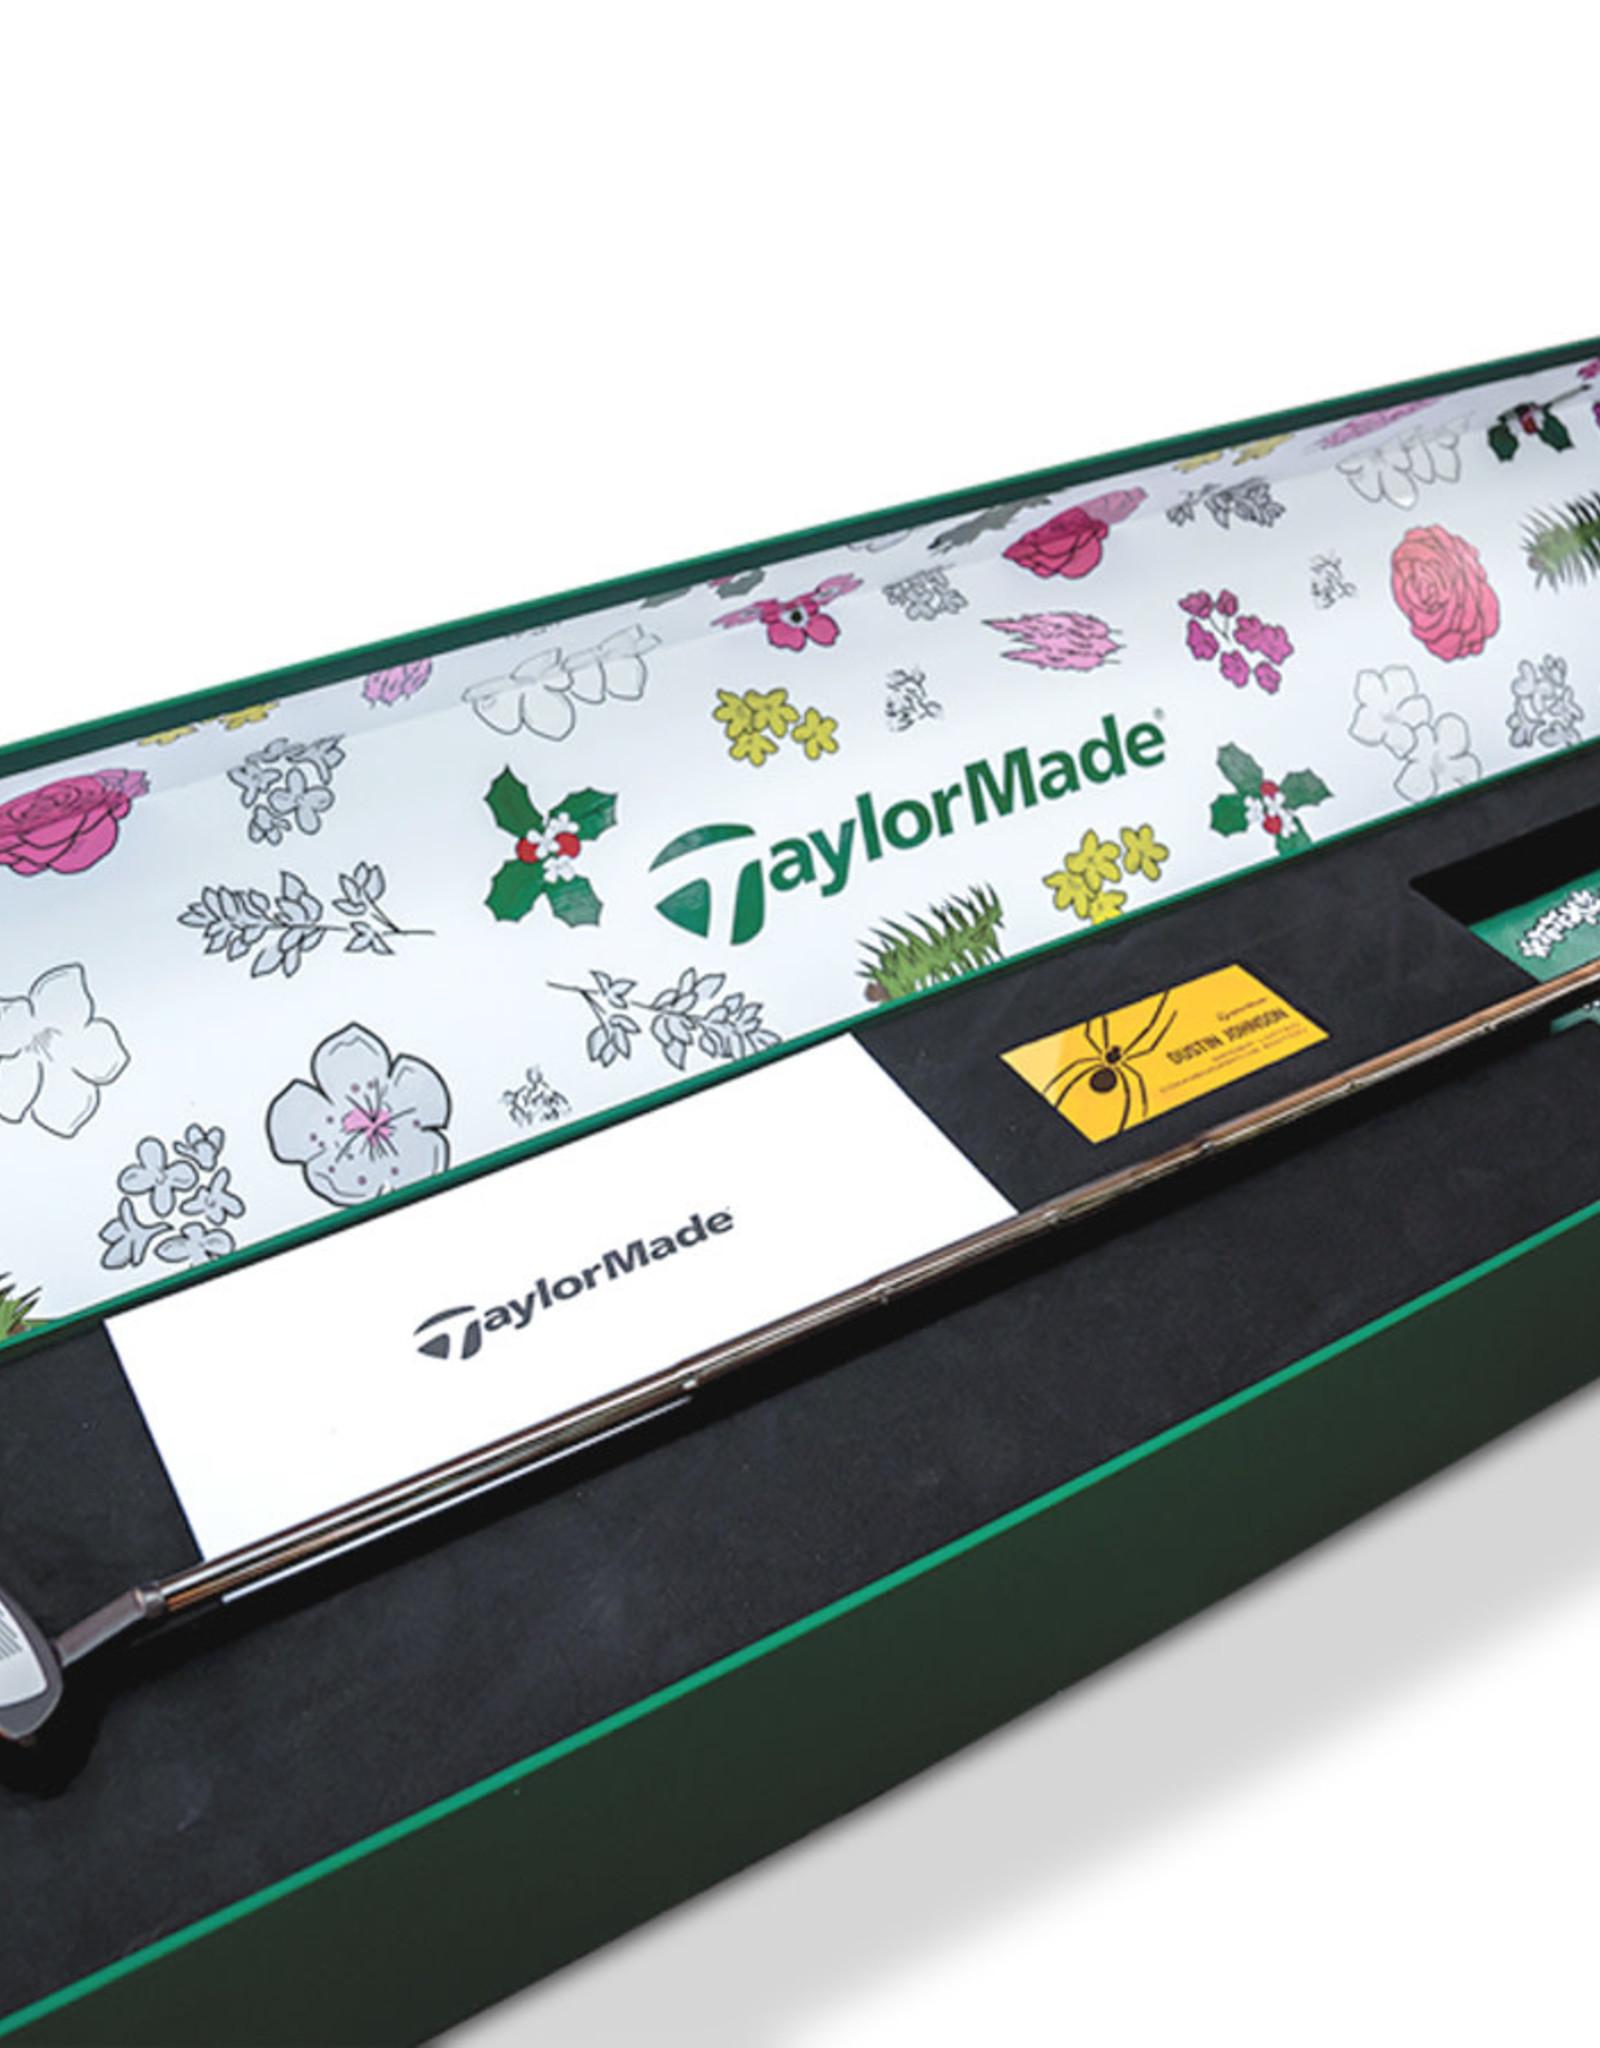 Taylormade DJ Commemorative Spider Putter